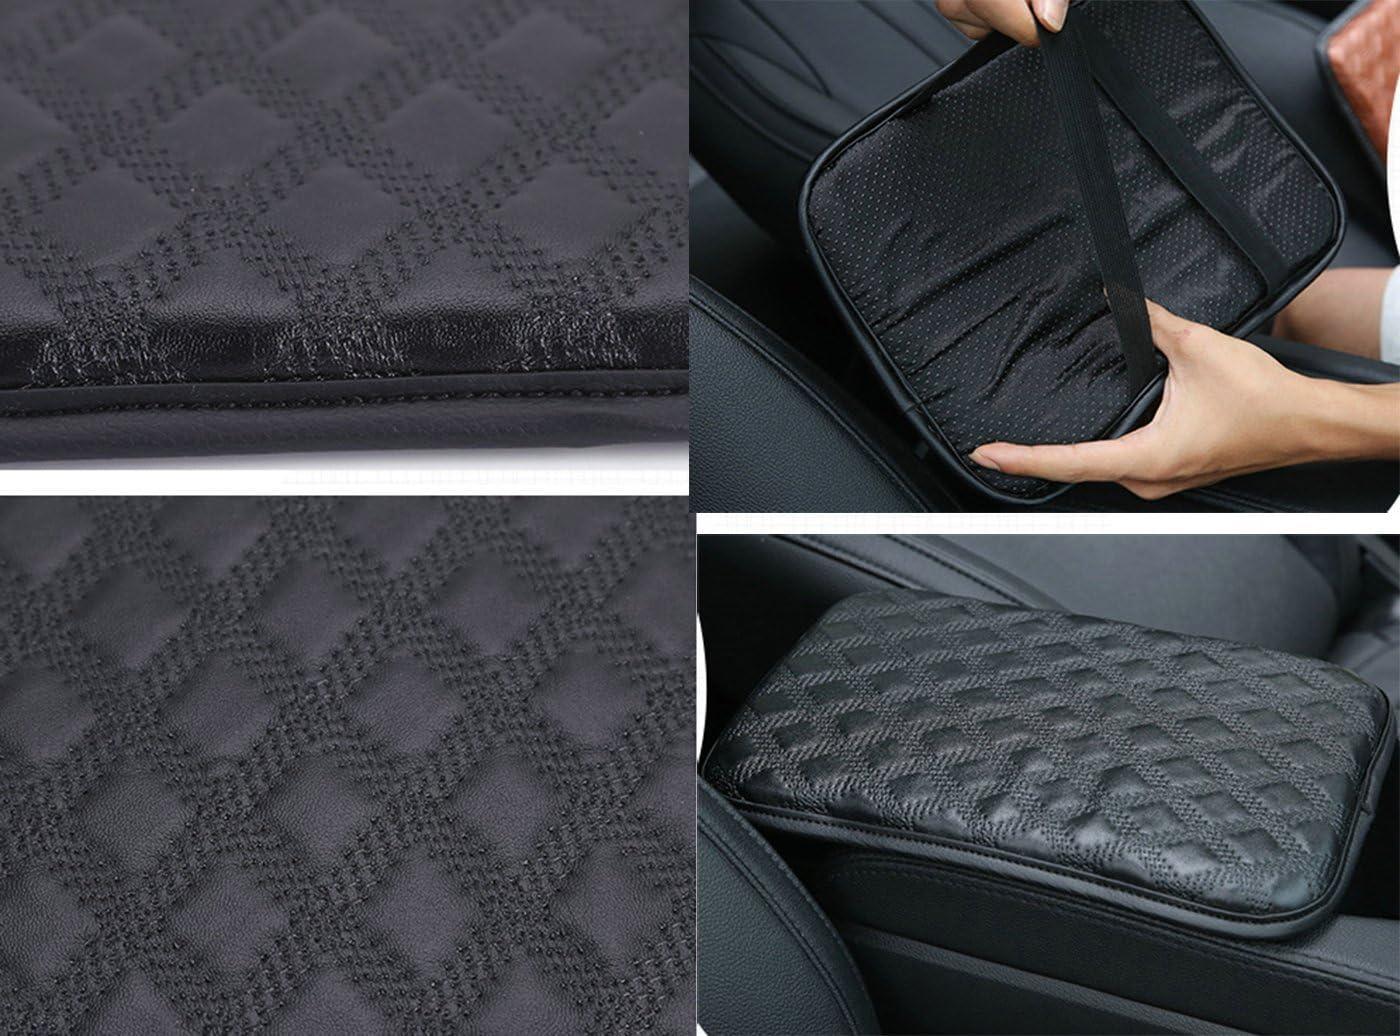 without logo Bearfire Car Armrest Cushion Soft Leather Auto Center Console Pad Cover Handrail Box Universal Ergonomic Design Decoration Cushion